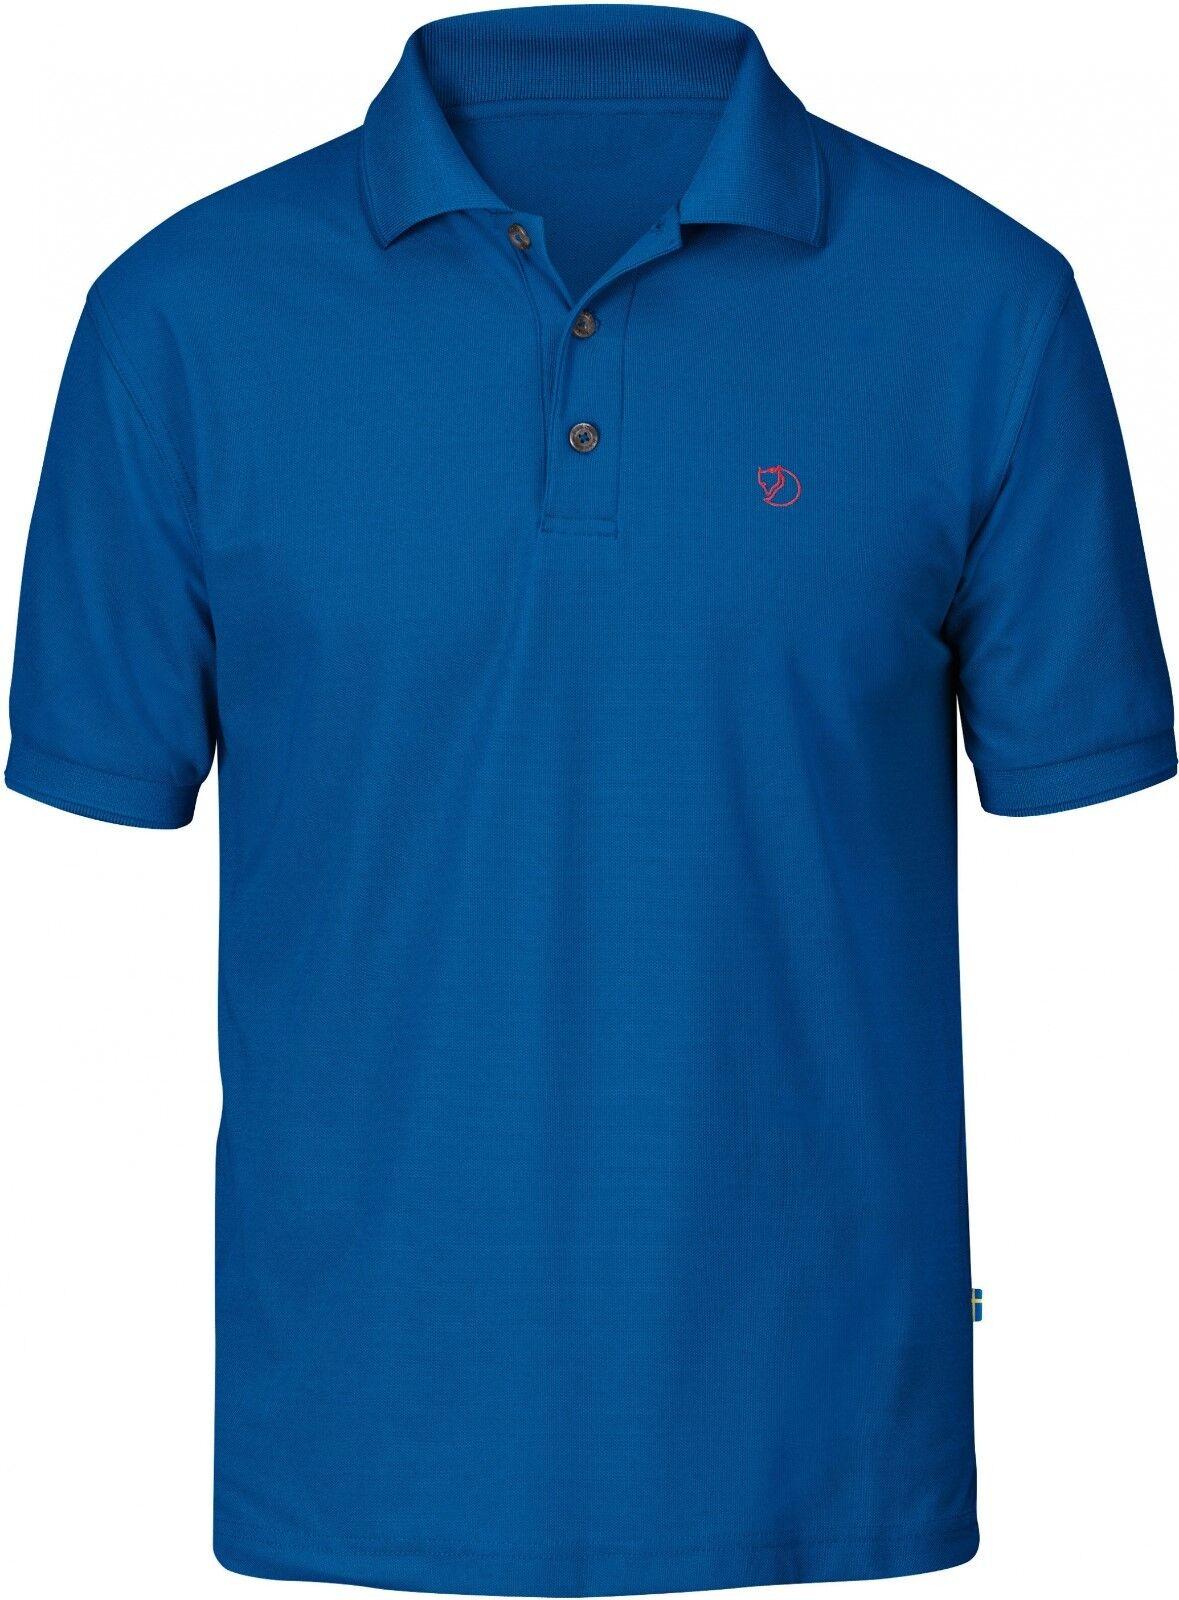 Fjäll Räven Crowley Pique Shirt for Men, Polo Shirt, Bay bluee, Size M